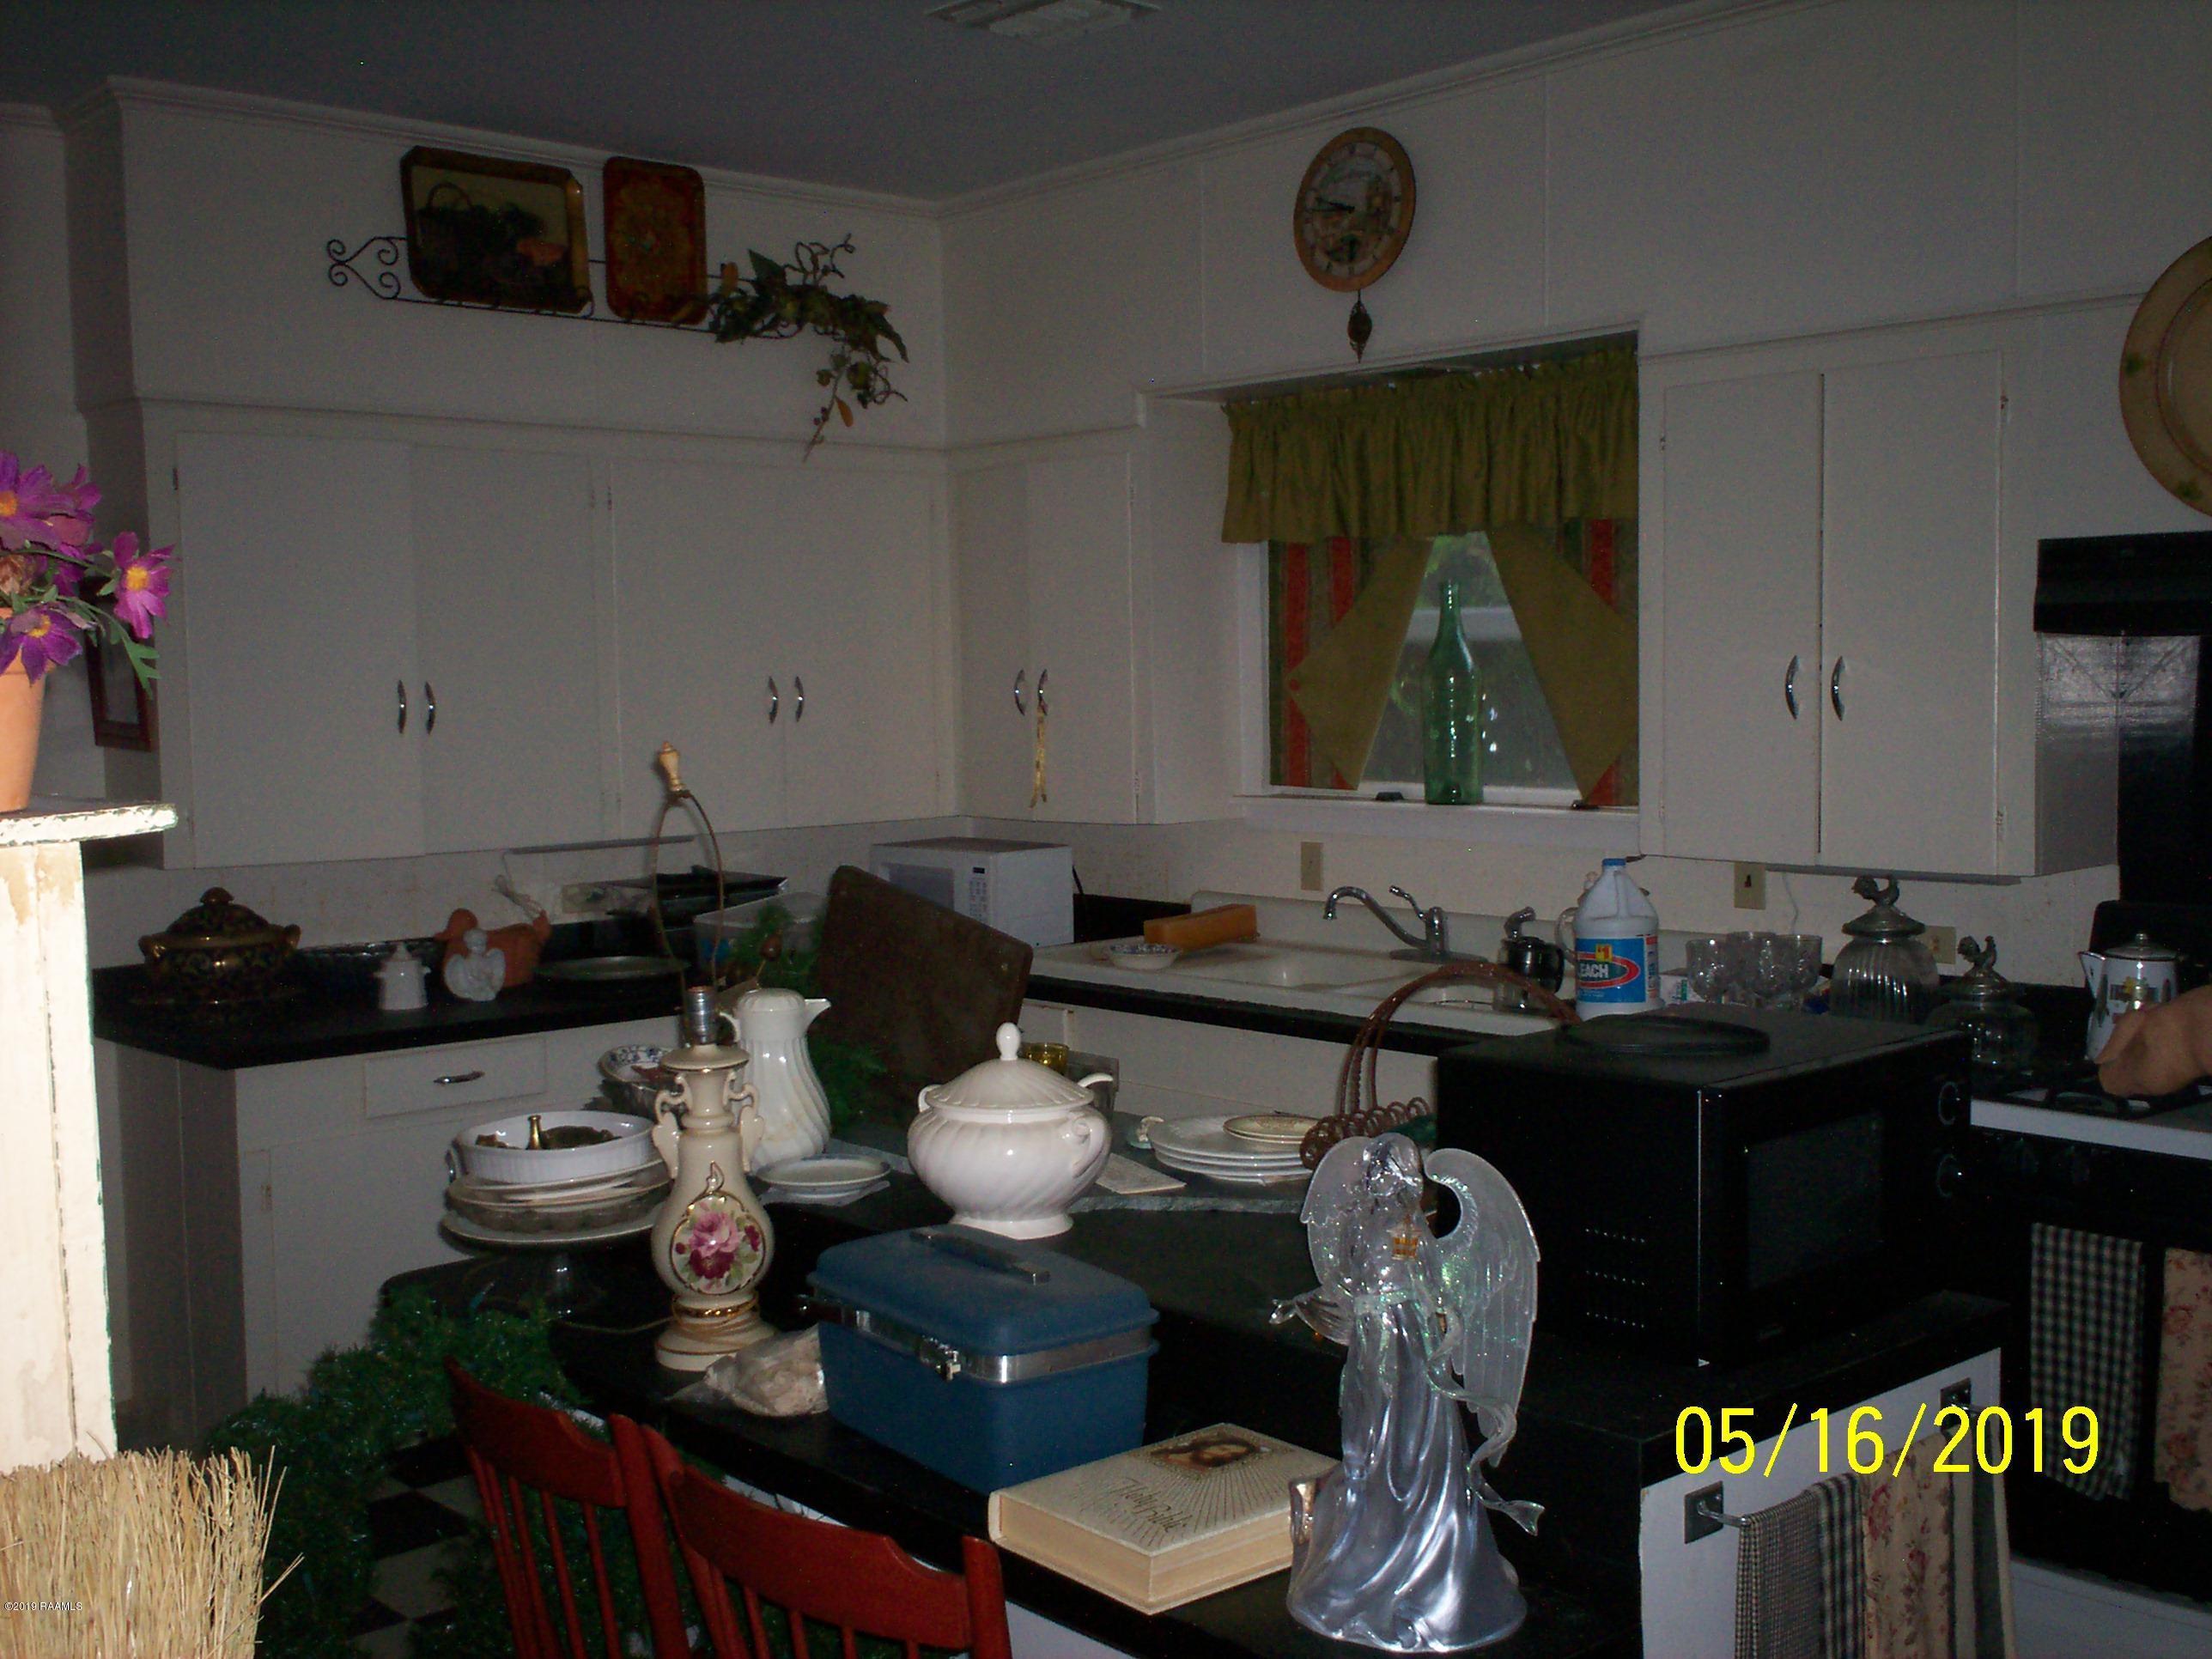 212 Washington Street, St. Martinville, LA 70582 Photo #2